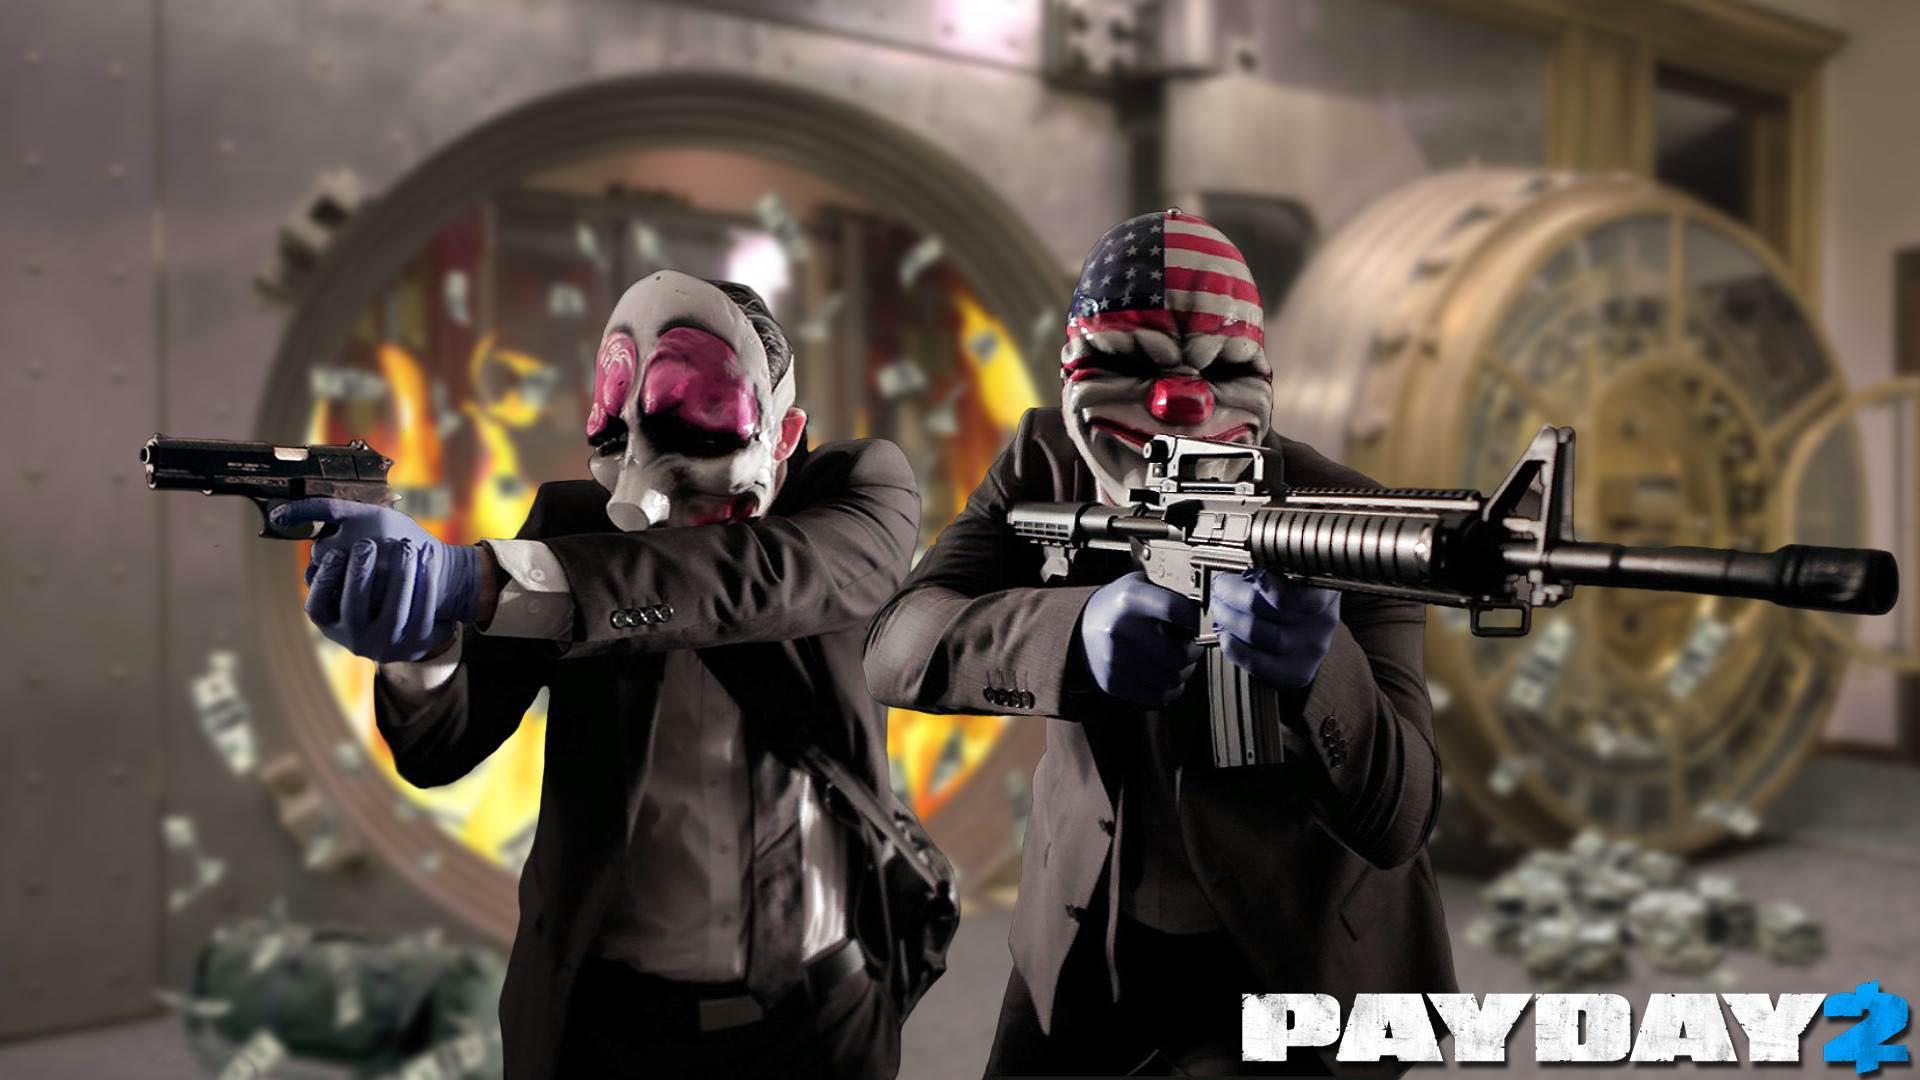 Hd wallpaper ios - Wallpapers Fond D Ecran Pour Payday 2 Pc Ps3 Xbox 360